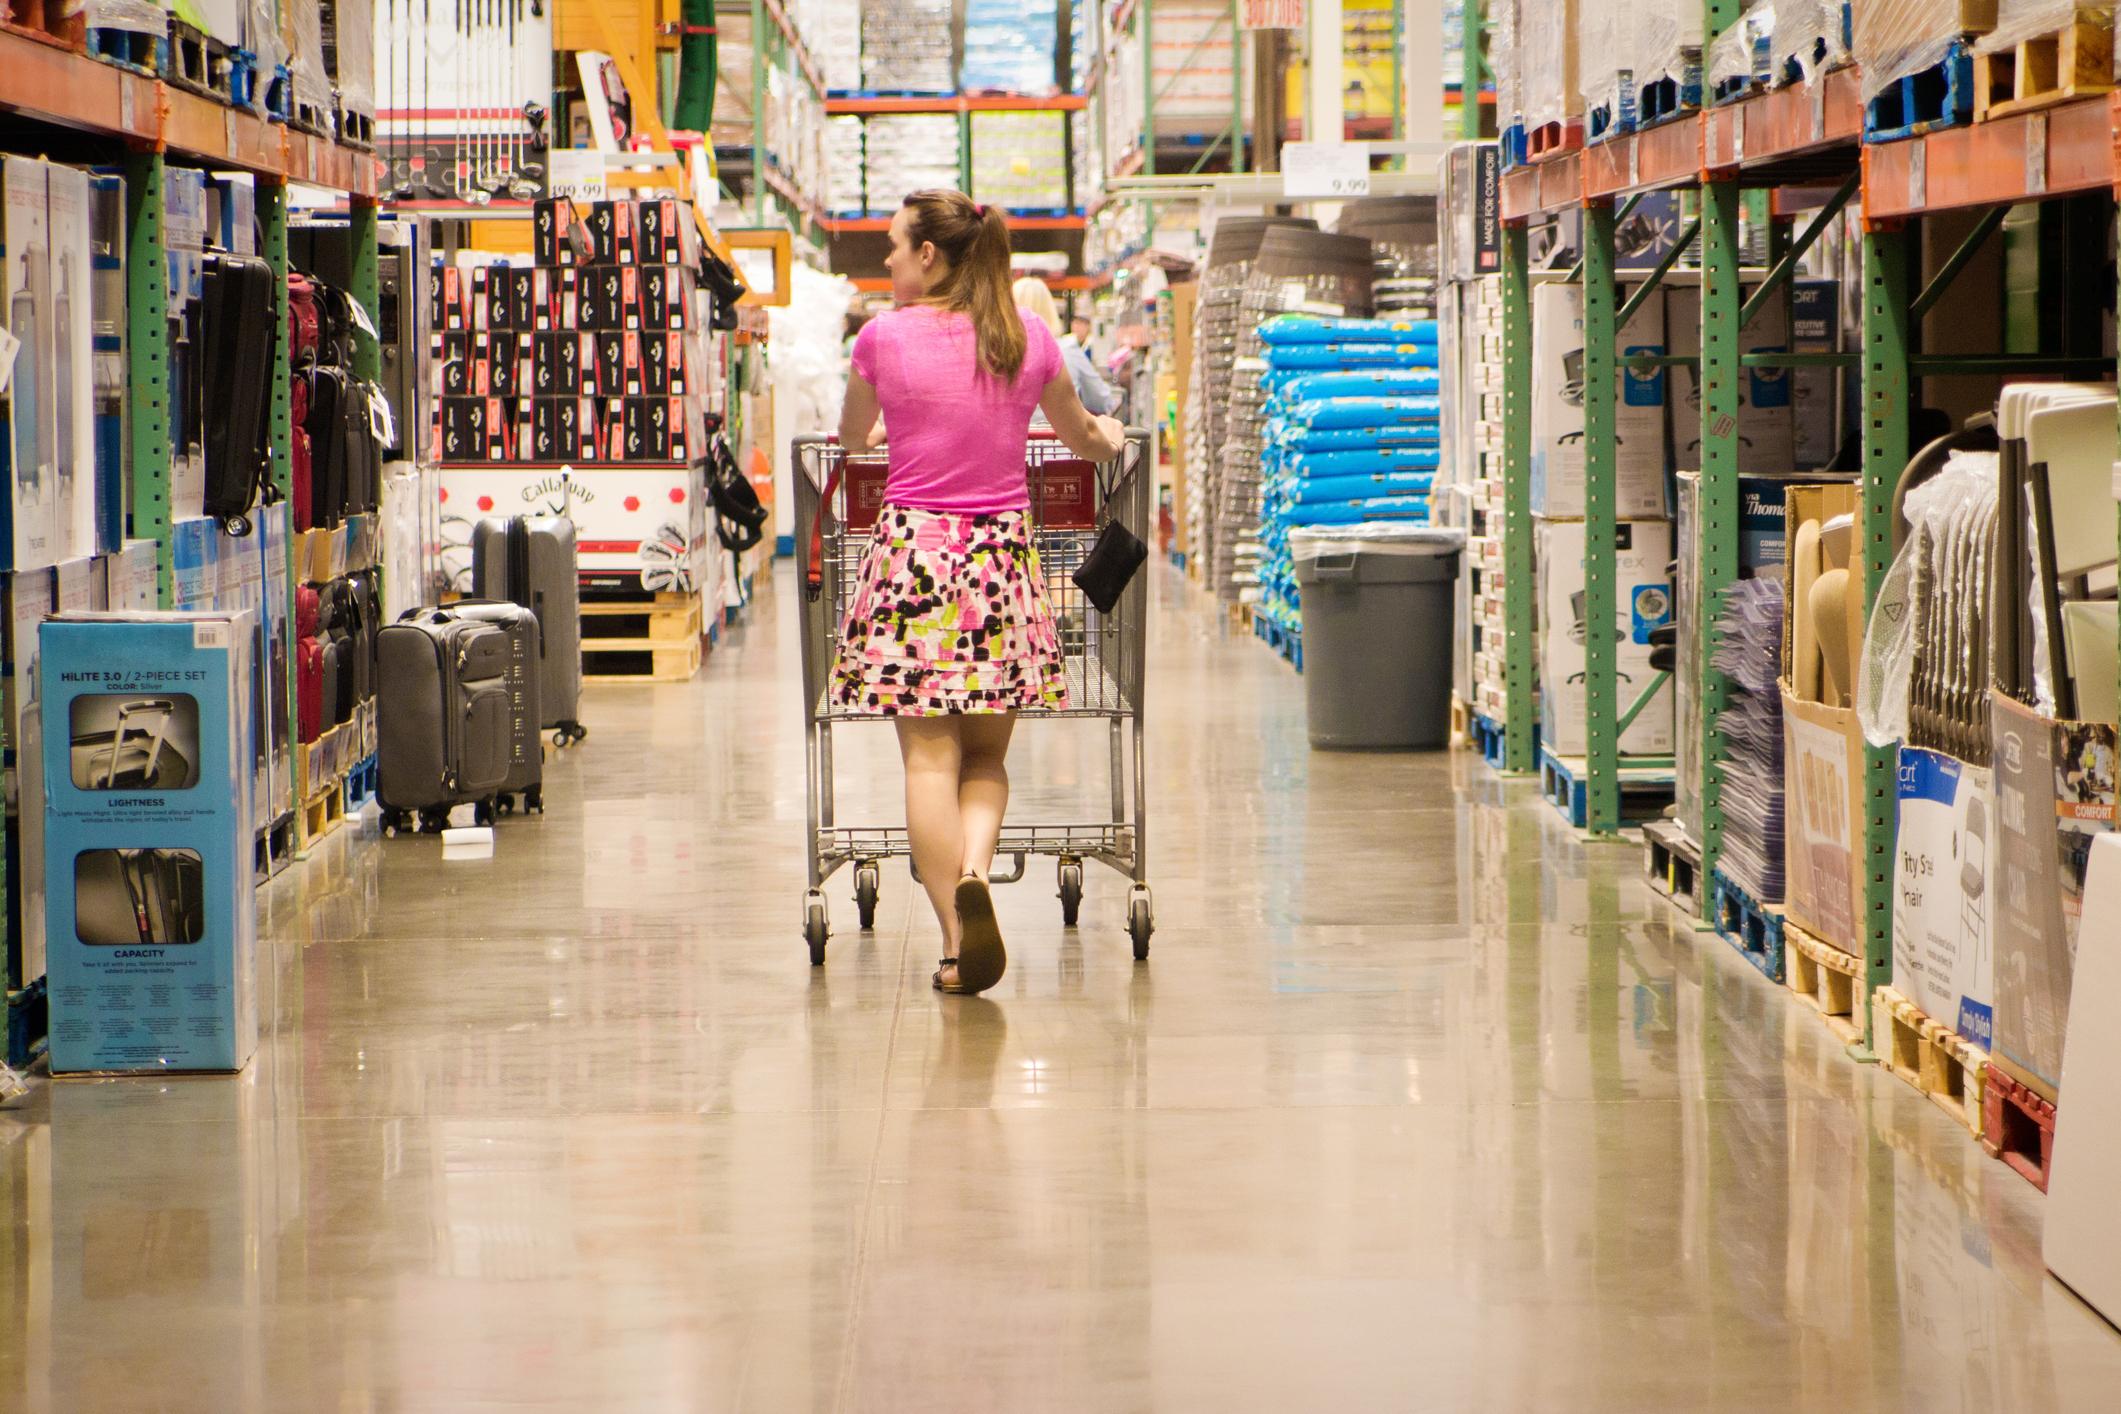 A shopper browses the aisles at a warehouse retailer.